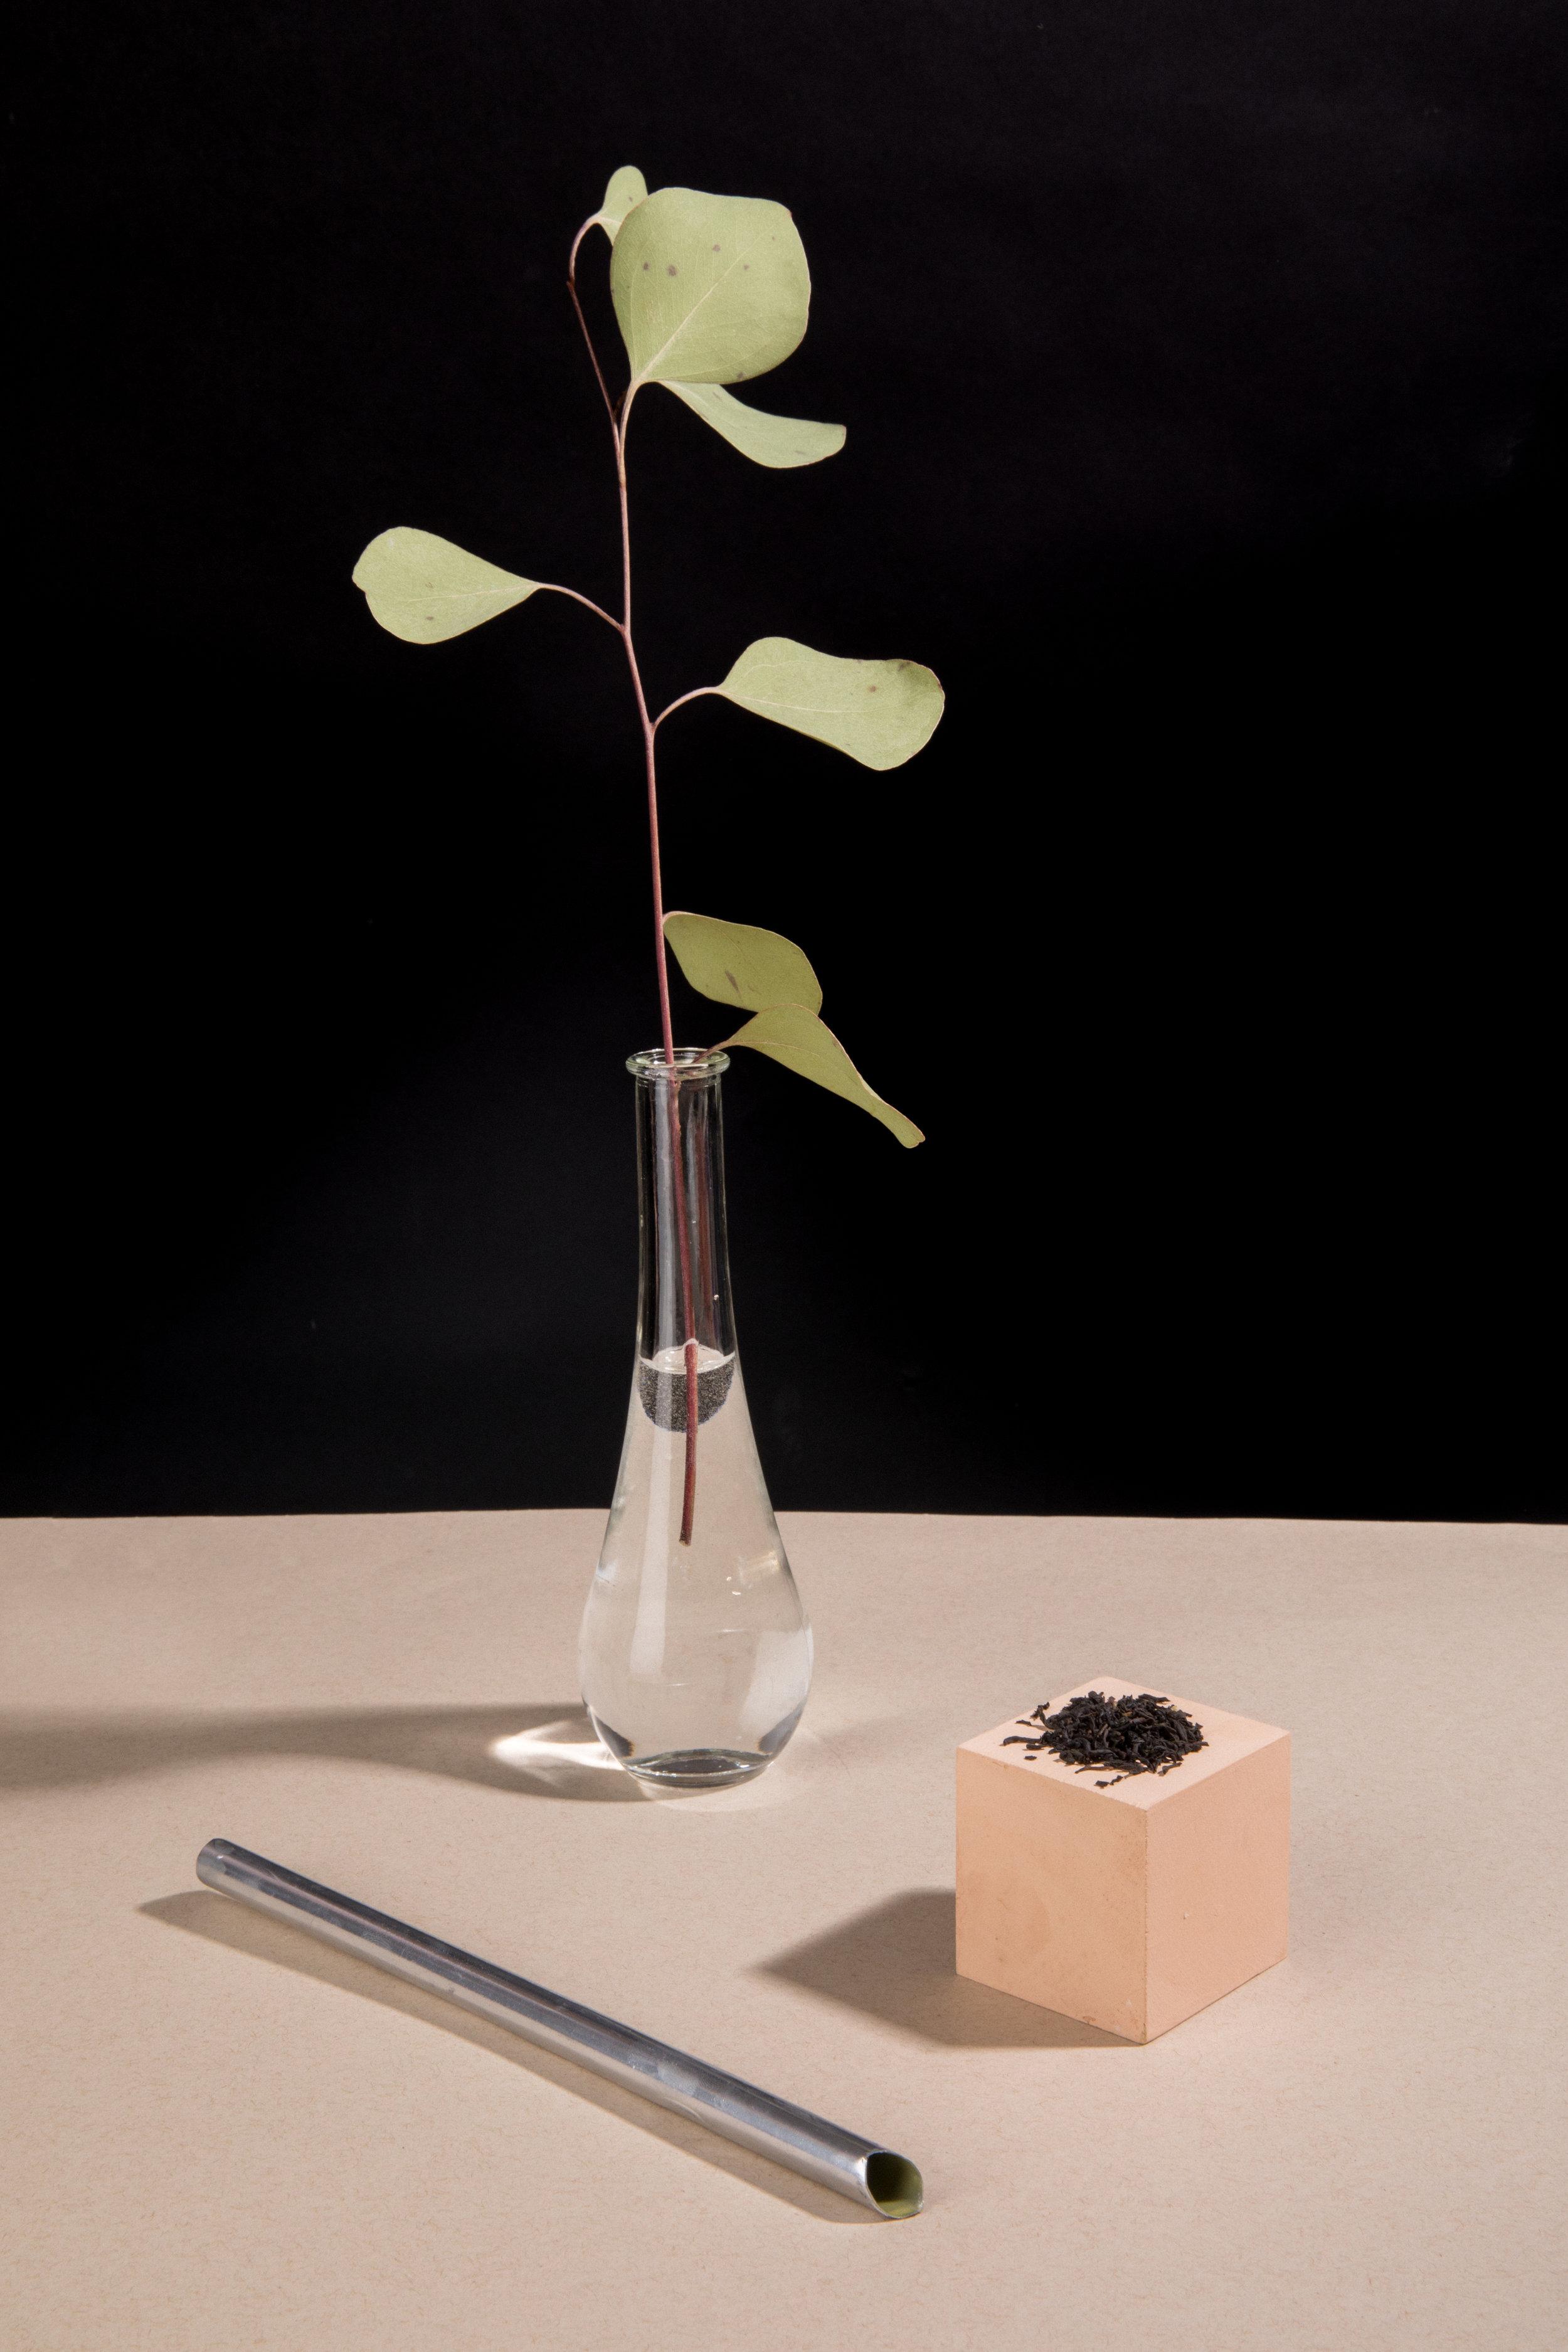 Tea Leaves - Tea Company - Styled by Judy Zheng